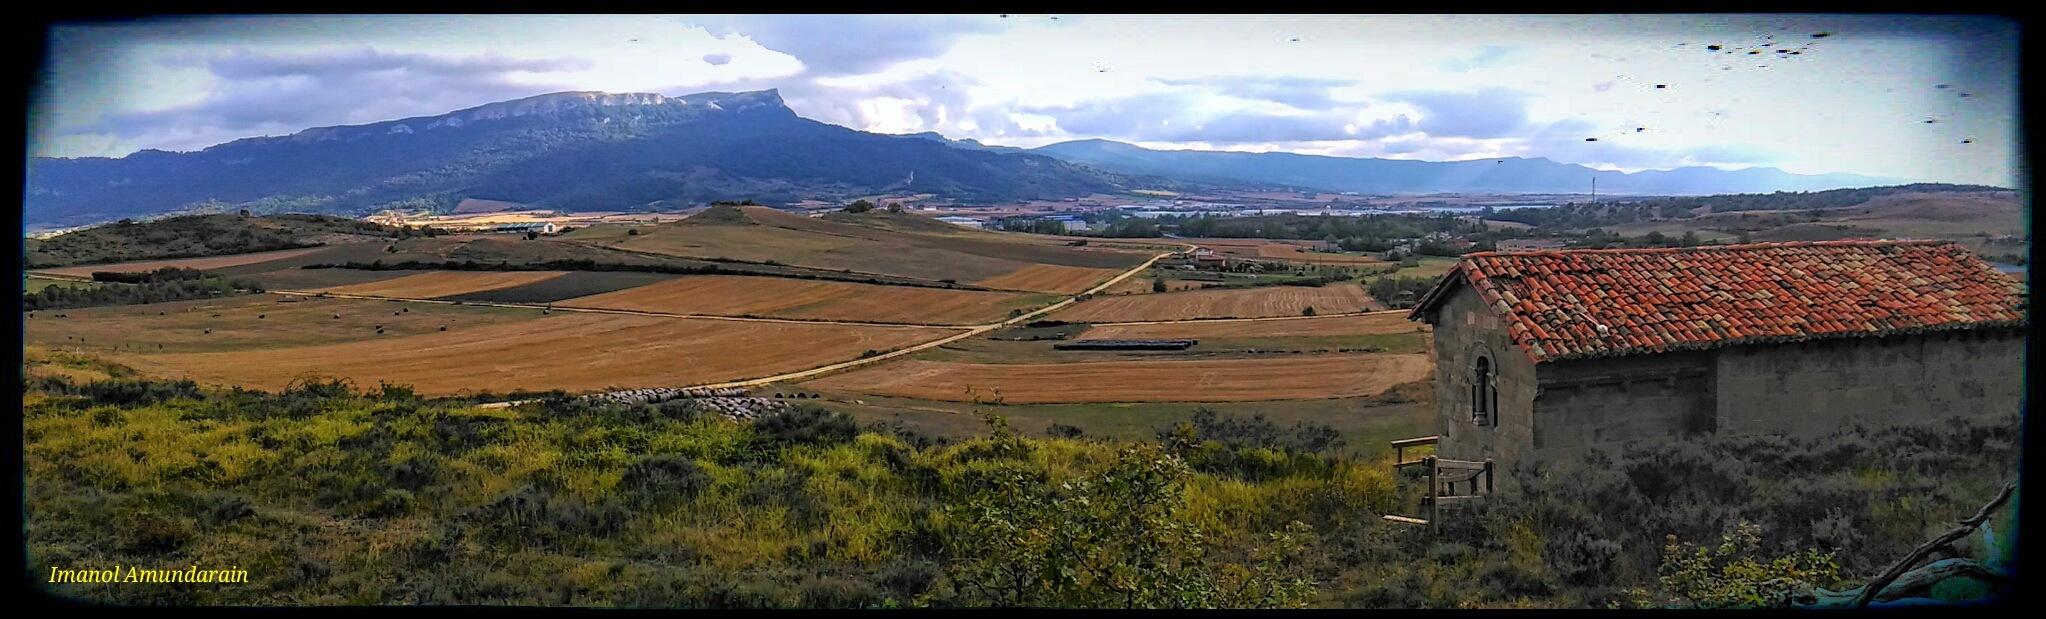 Asparrena's landscape in Álava / Basque Country / Euskal Herria by  Imanol Amunain Eyael